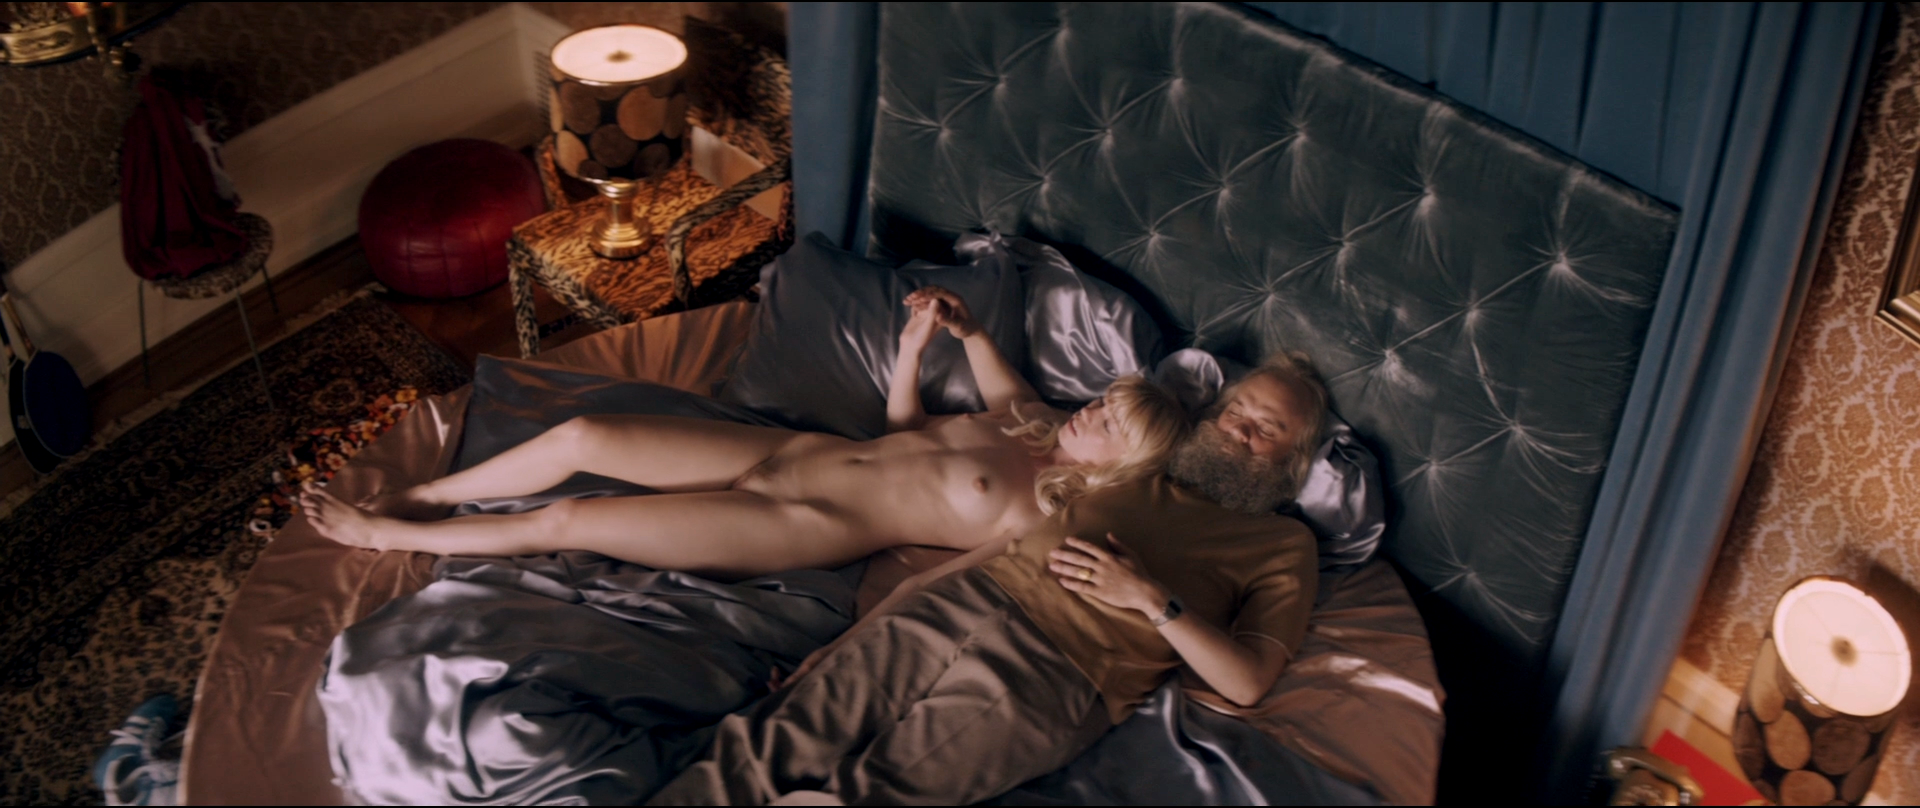 dok-film-seks